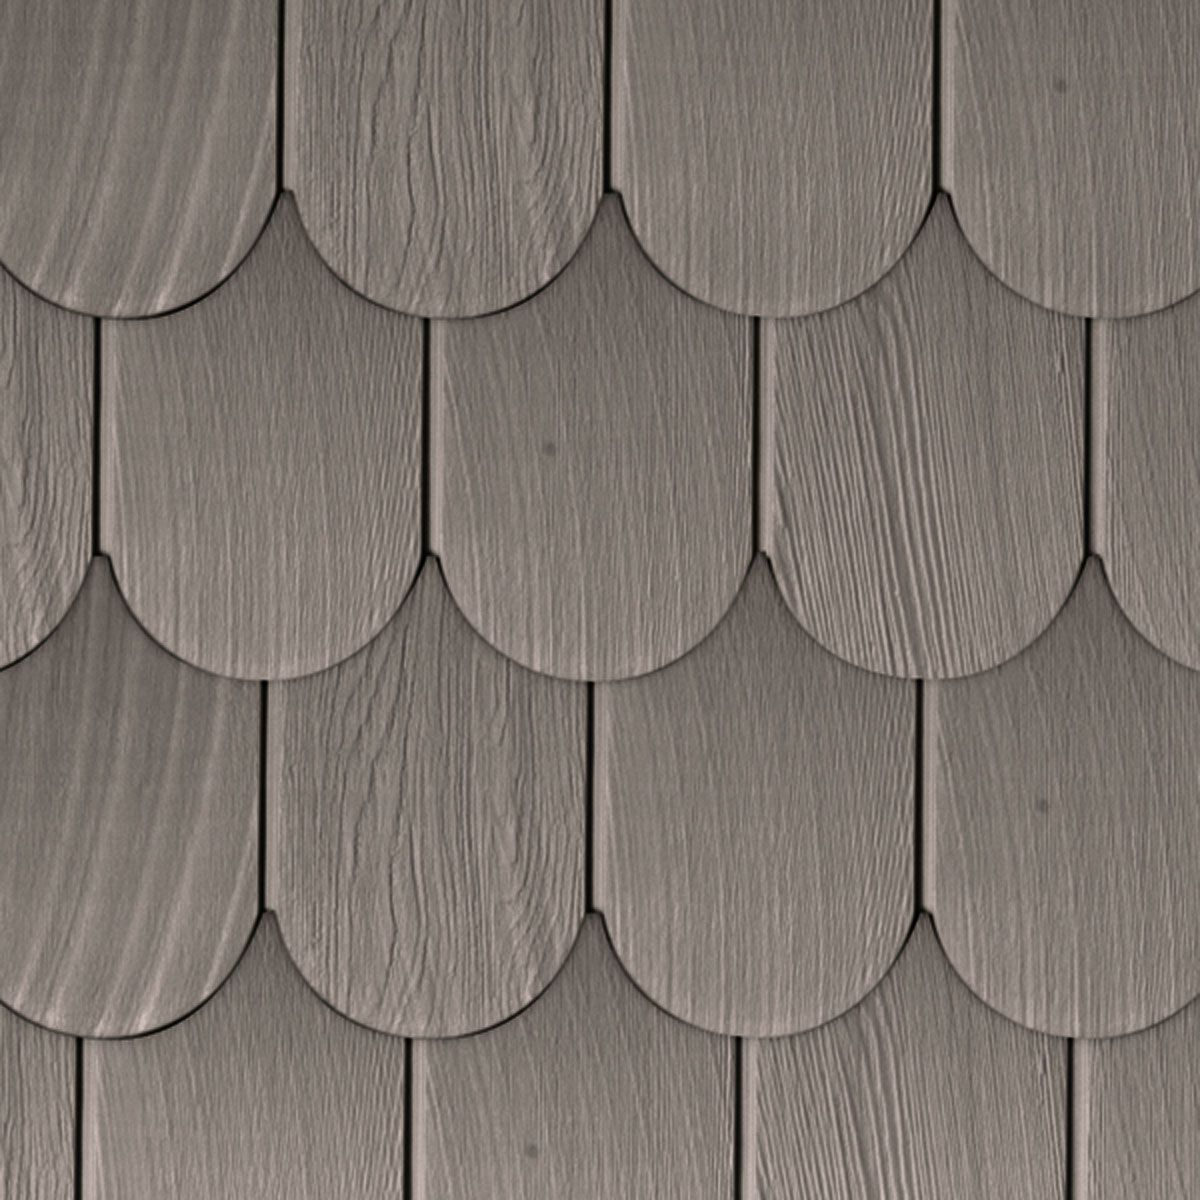 6 Inch W X 60 Inch L Exposure Vinyl Round Shingles 20 Panels Ctn 50 Sq Feet 242 Shale Vinyl Shake Siding Vinyl Siding Shingling